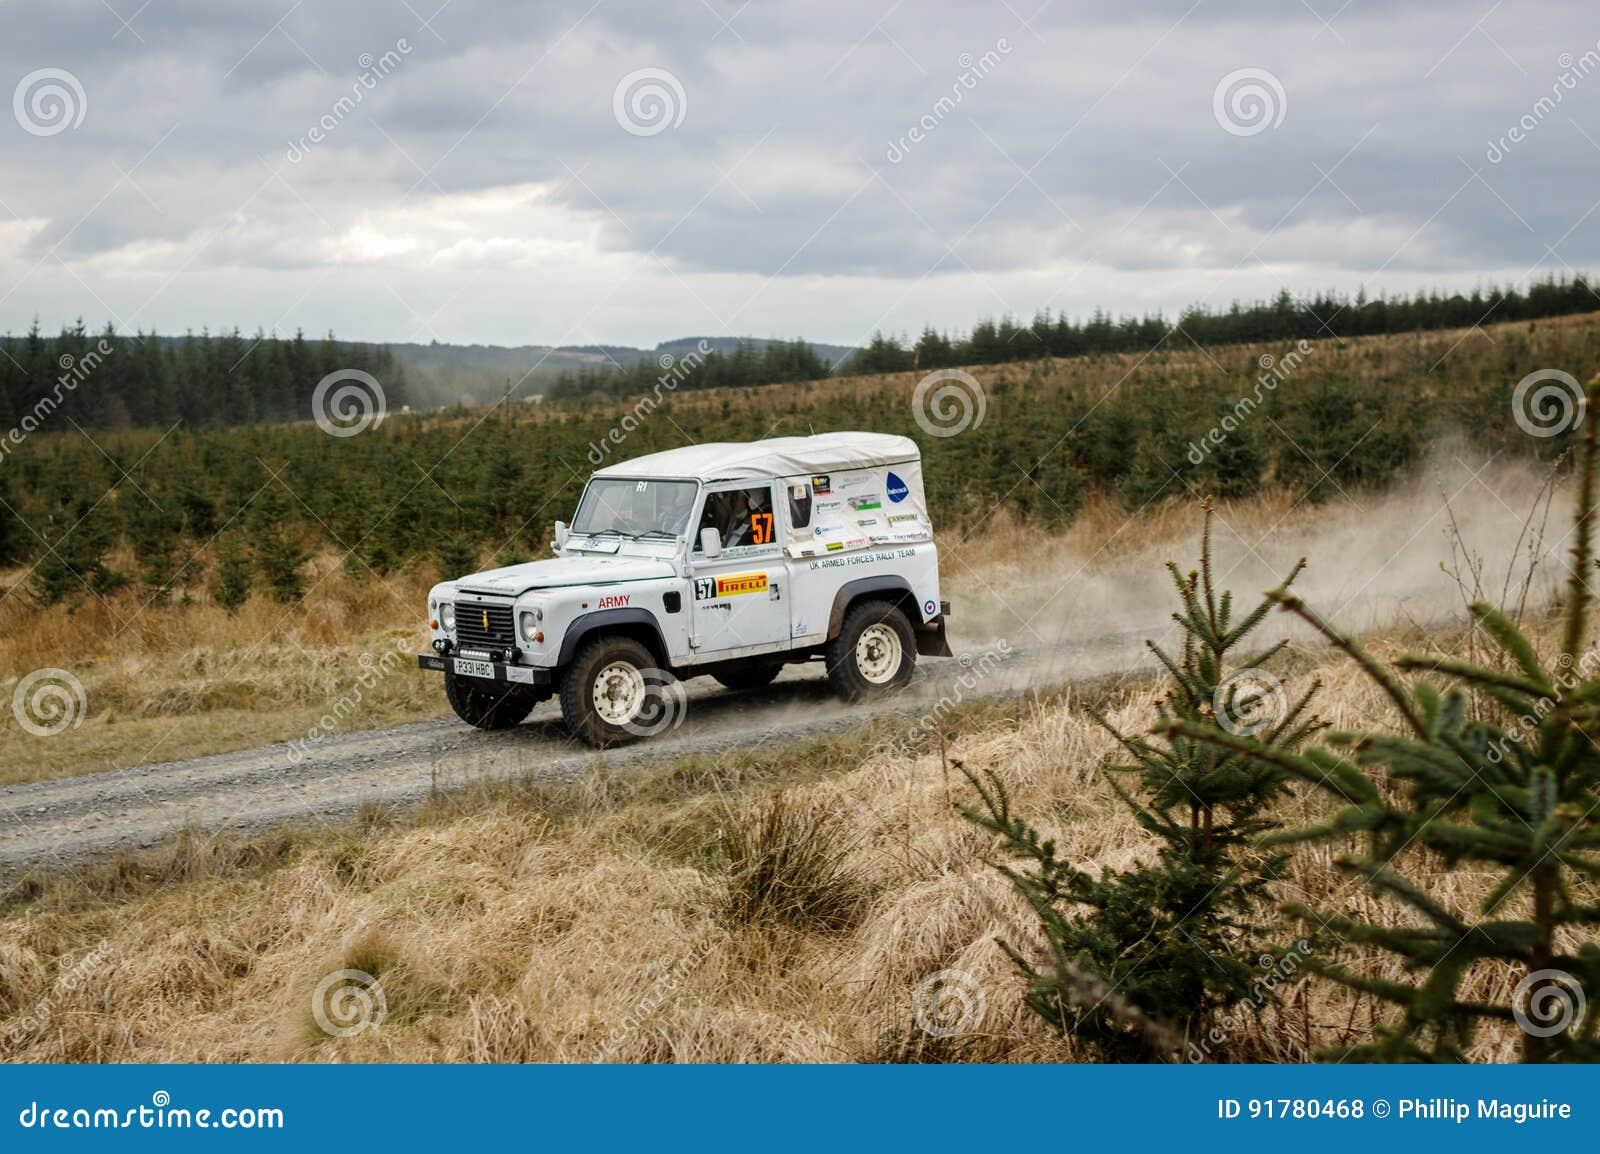 Car At Pirelli International Rally Editorial Stock Photo - Image of ...